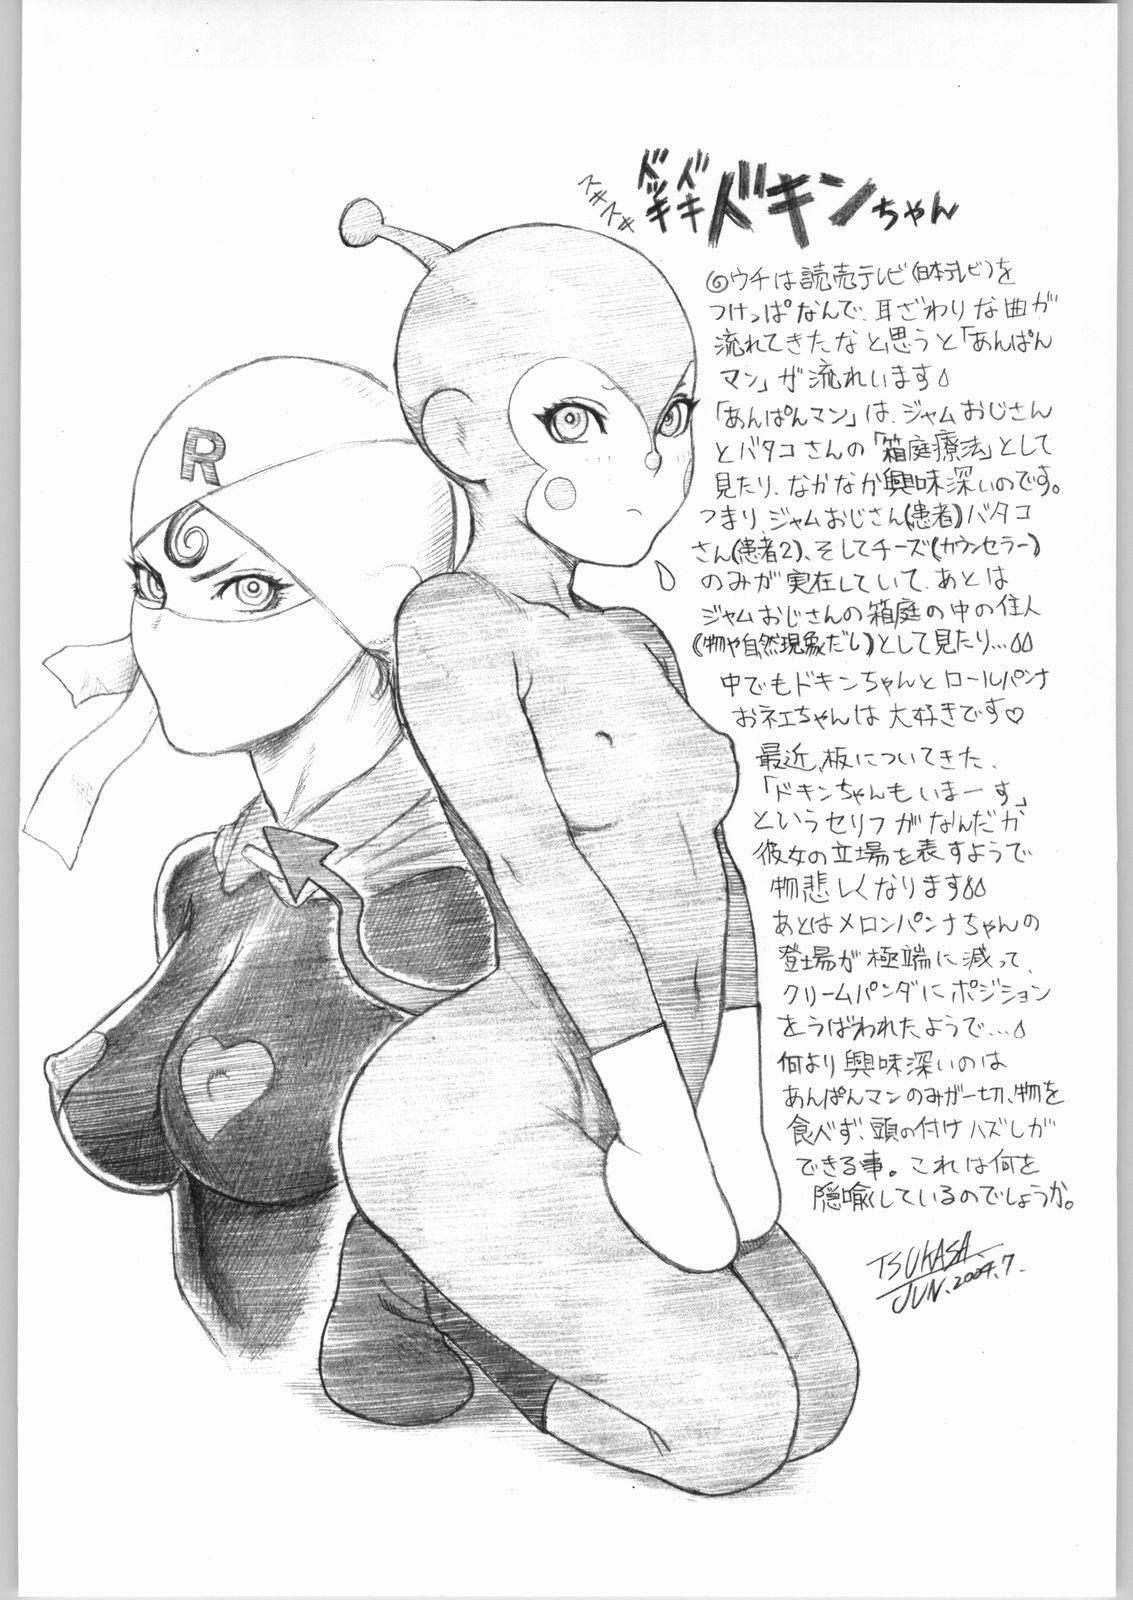 Kabushikigaisha Liver-Sashi 68